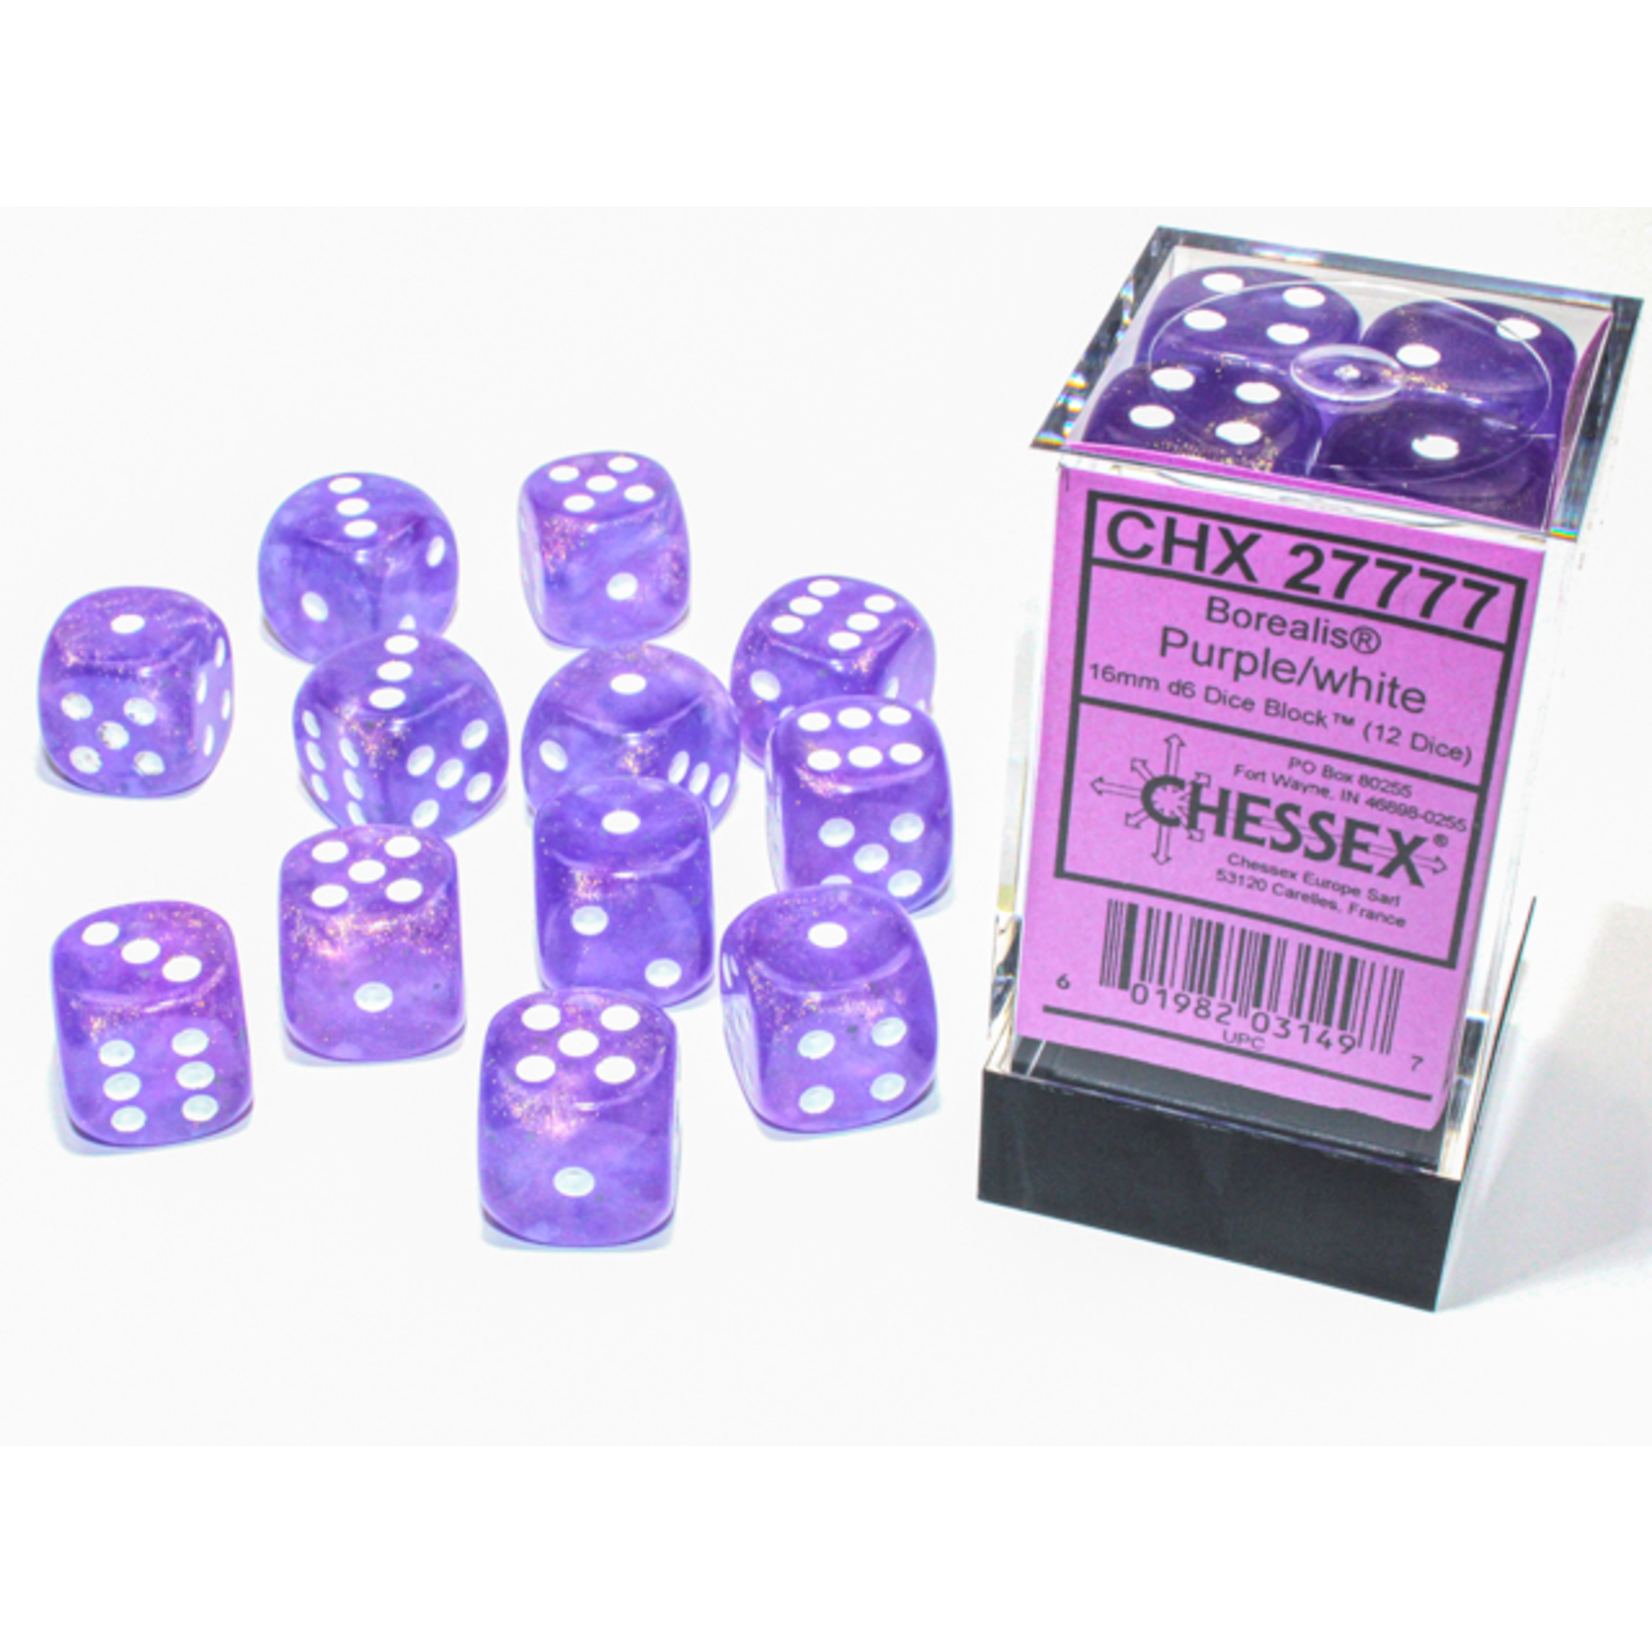 Chessex D6 Cube 16mm Borealis Luminary Purple with White Pips (CHX)